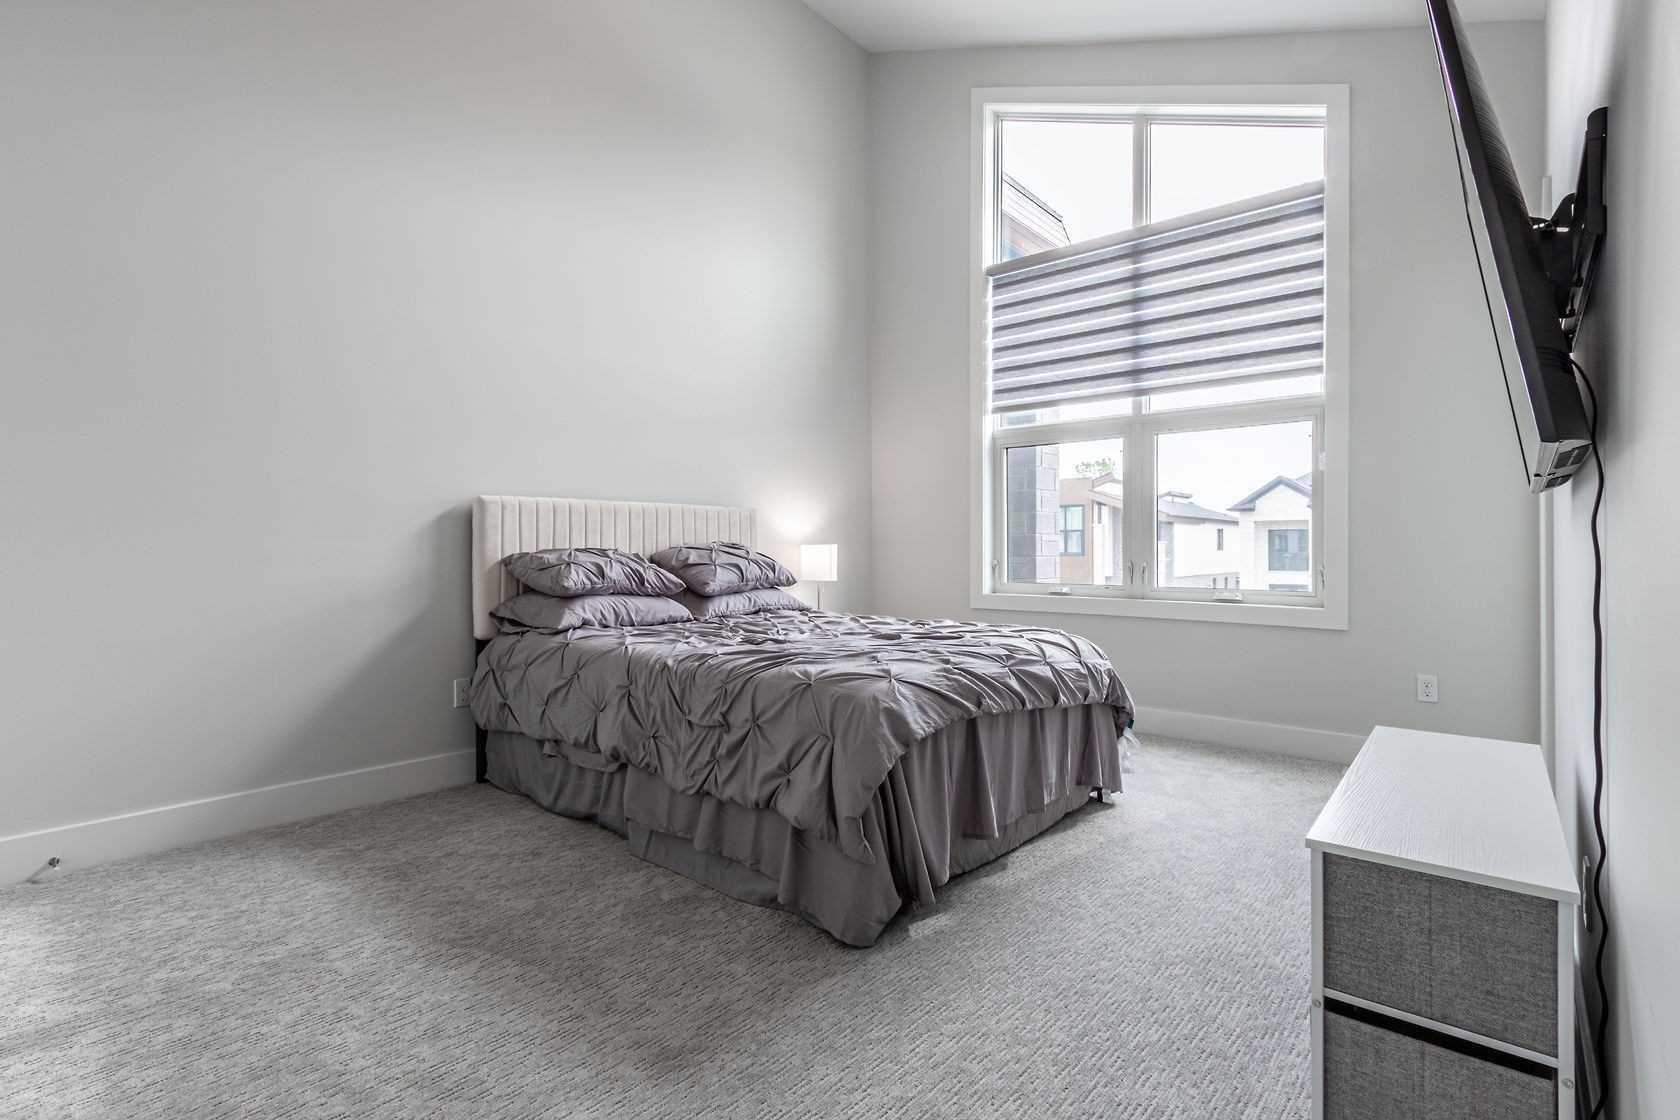 1772 Brayford Ave, London, Ontario N6K0H4, 4 Bedrooms Bedrooms, 11 Rooms Rooms,4 BathroomsBathrooms,Detached,For Sale,Brayford,X5350205